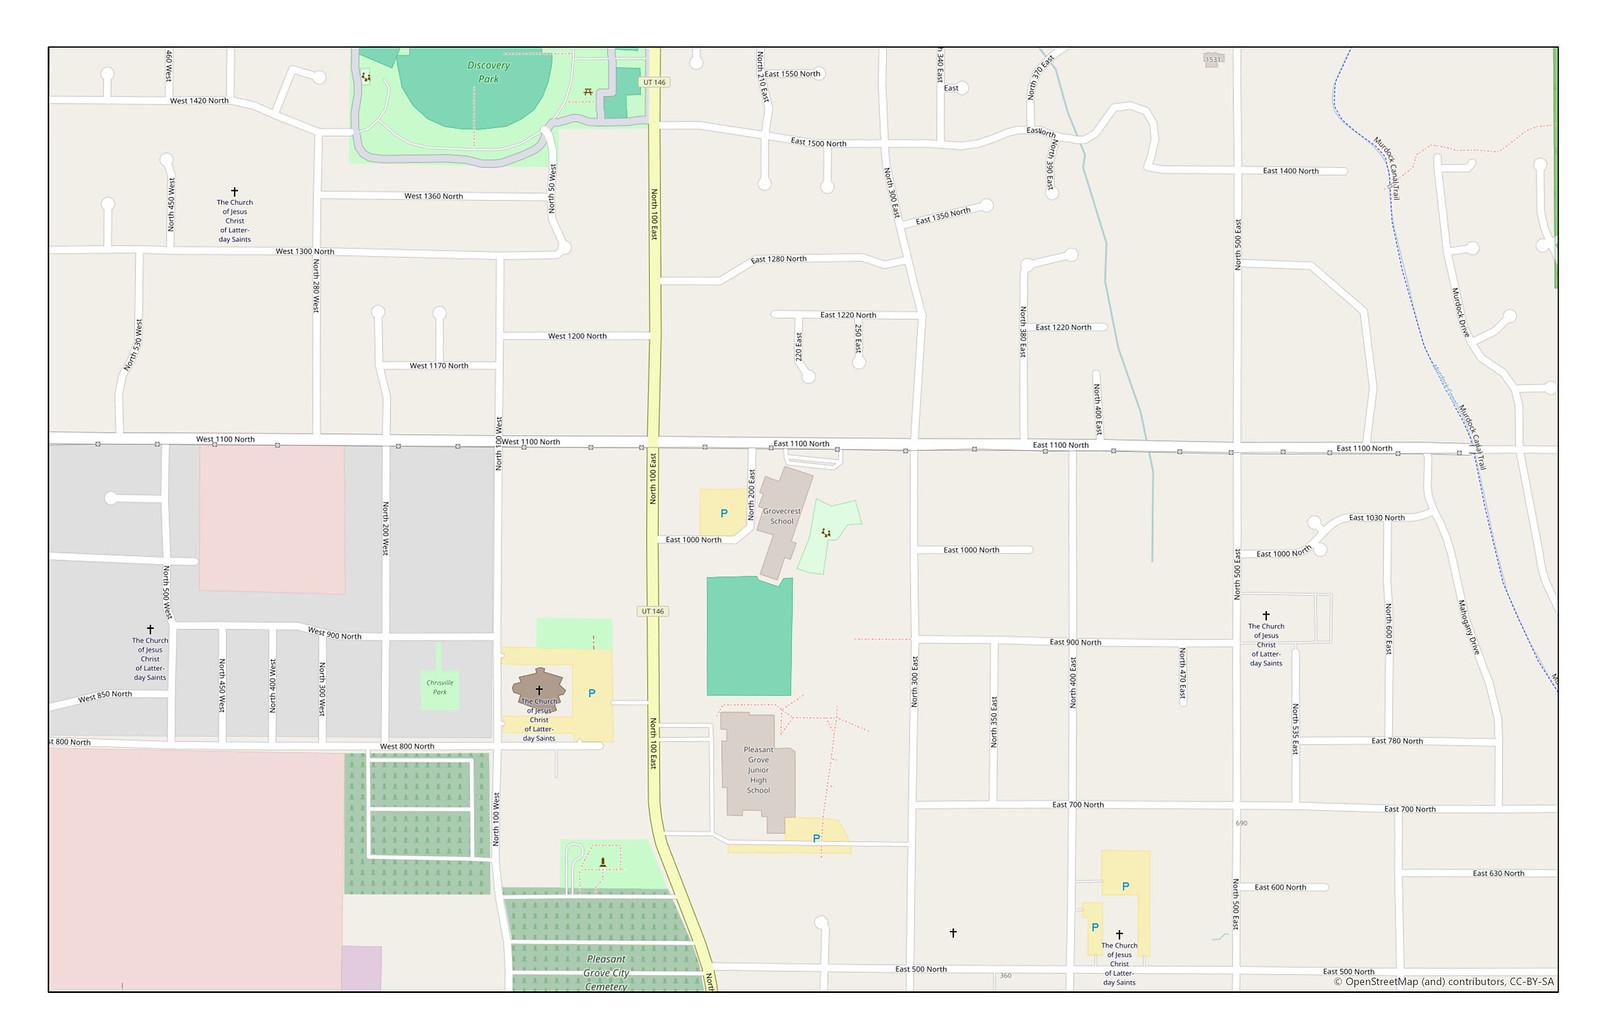 Open Street Map 1:5,000